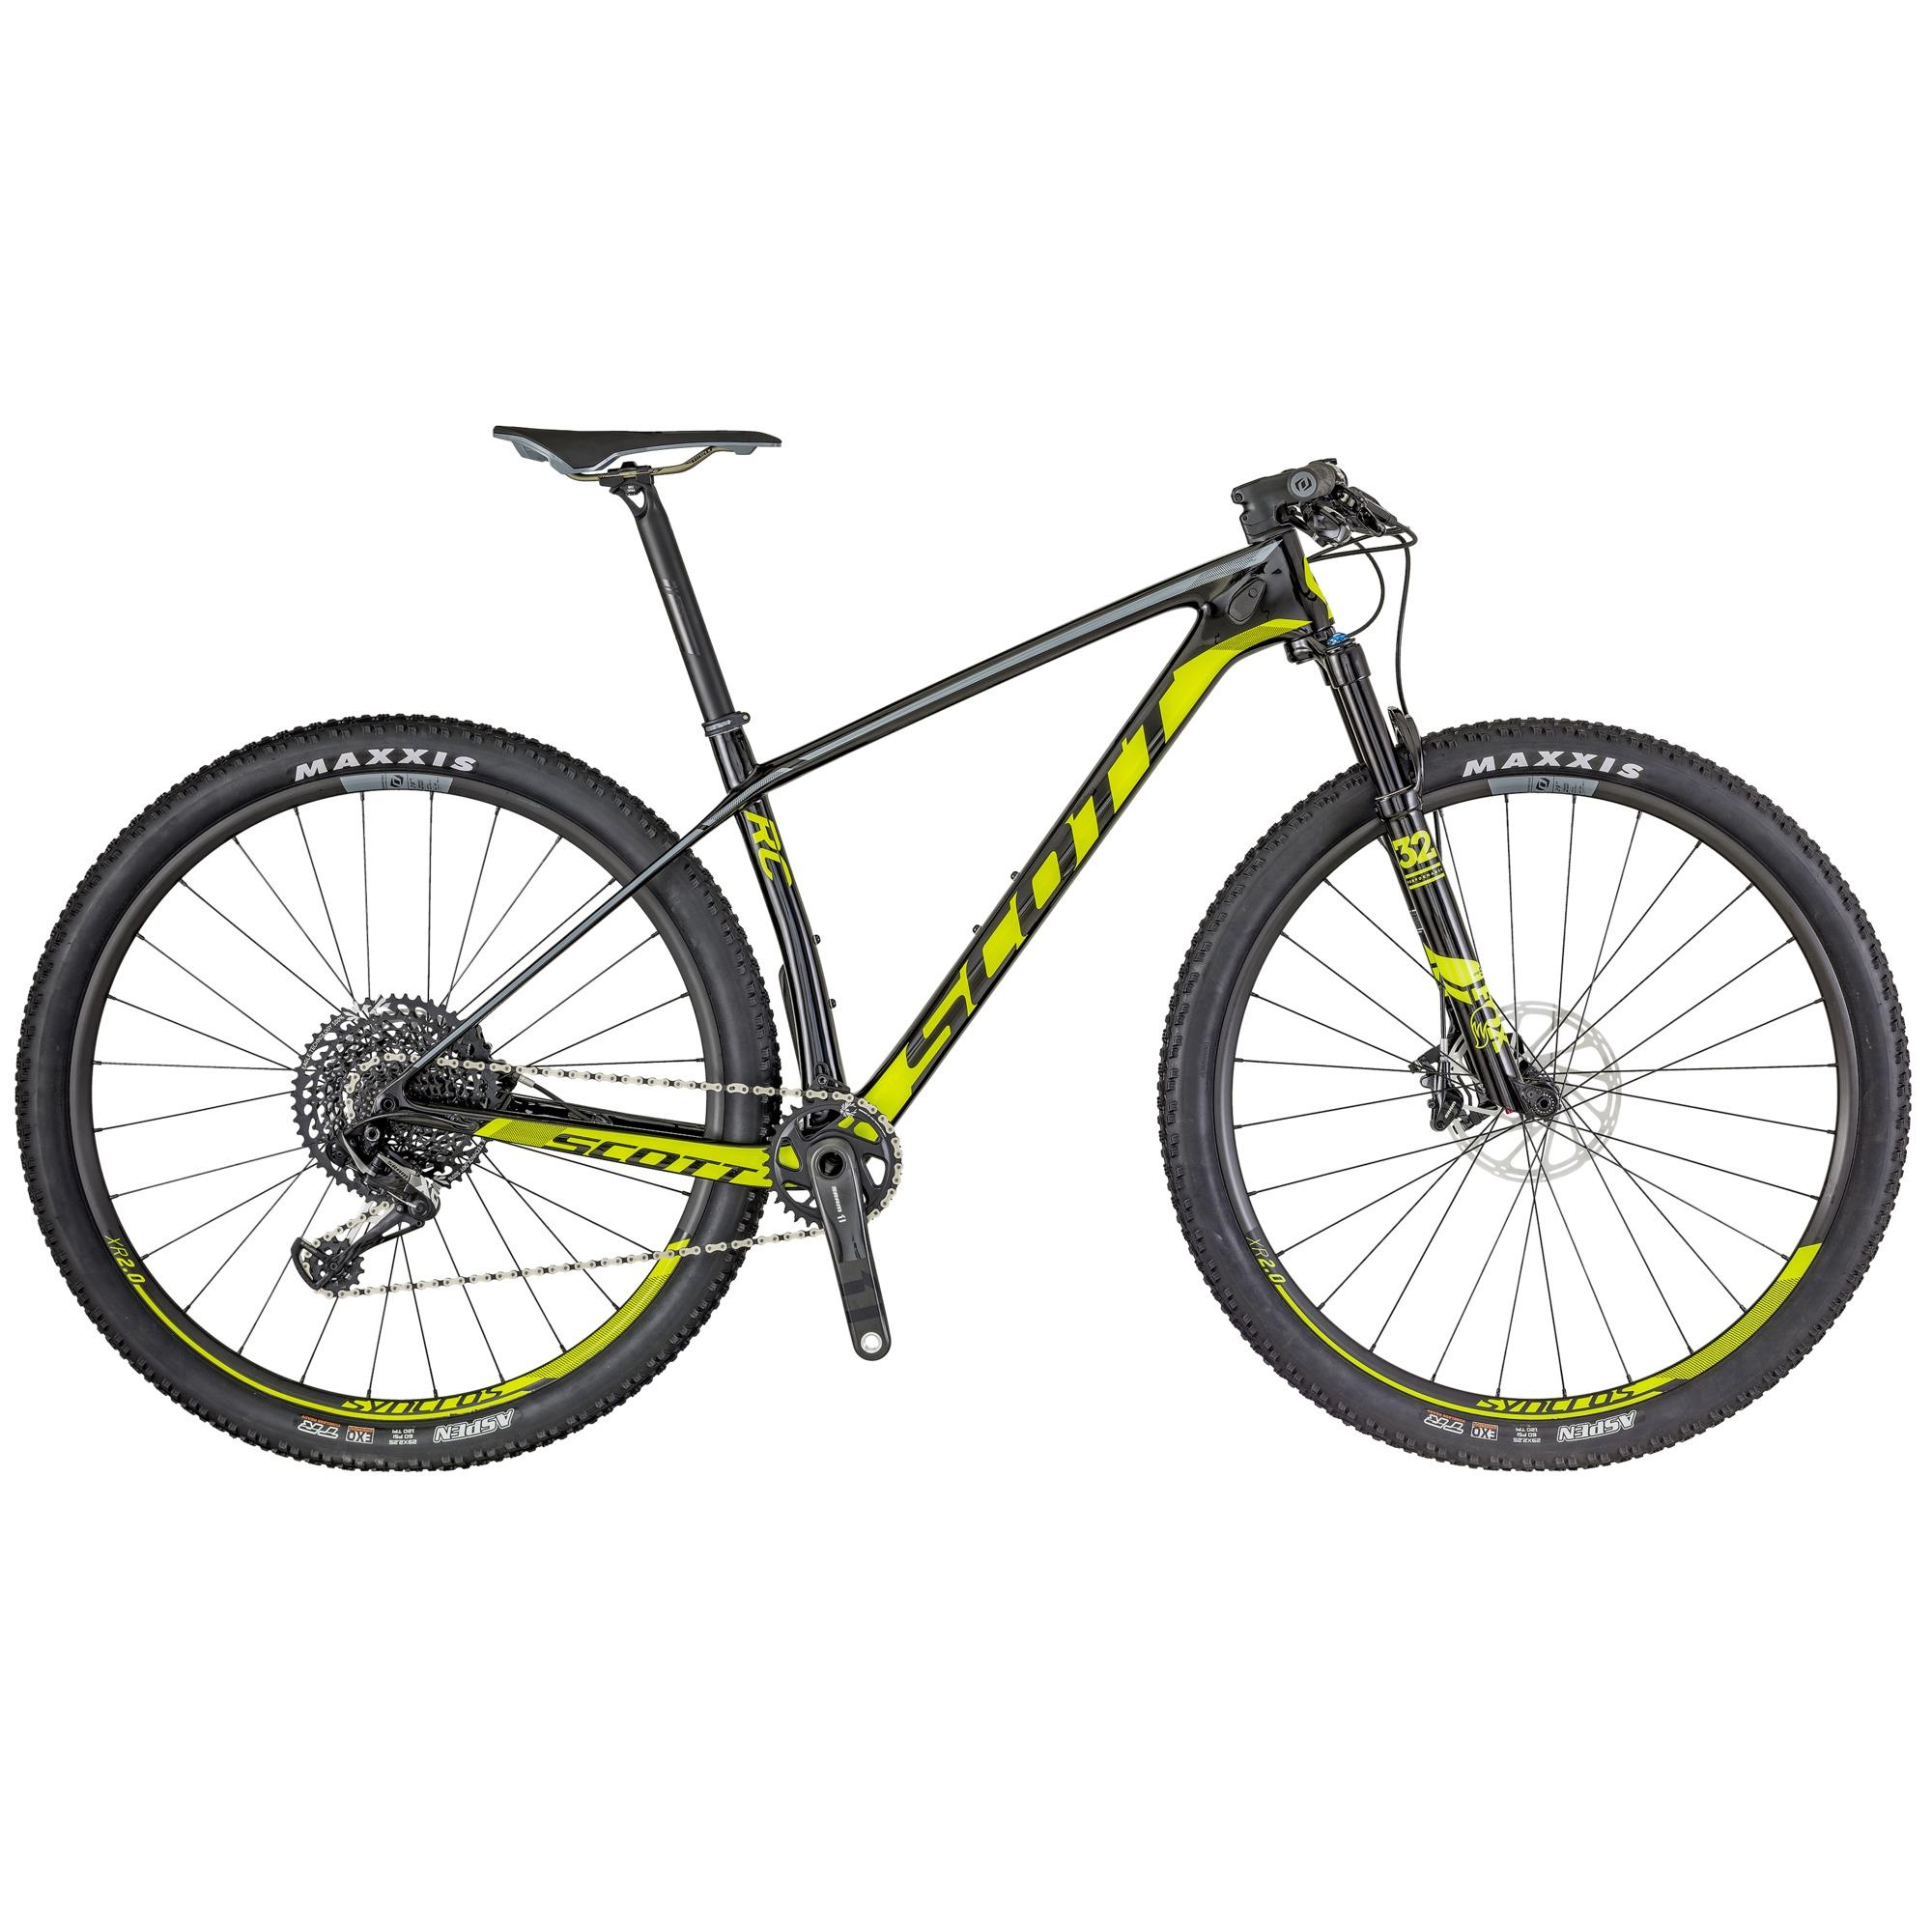 SCOTT Scale RC 900 Pro Bike M - Rad & Dämpferklinik GmbH